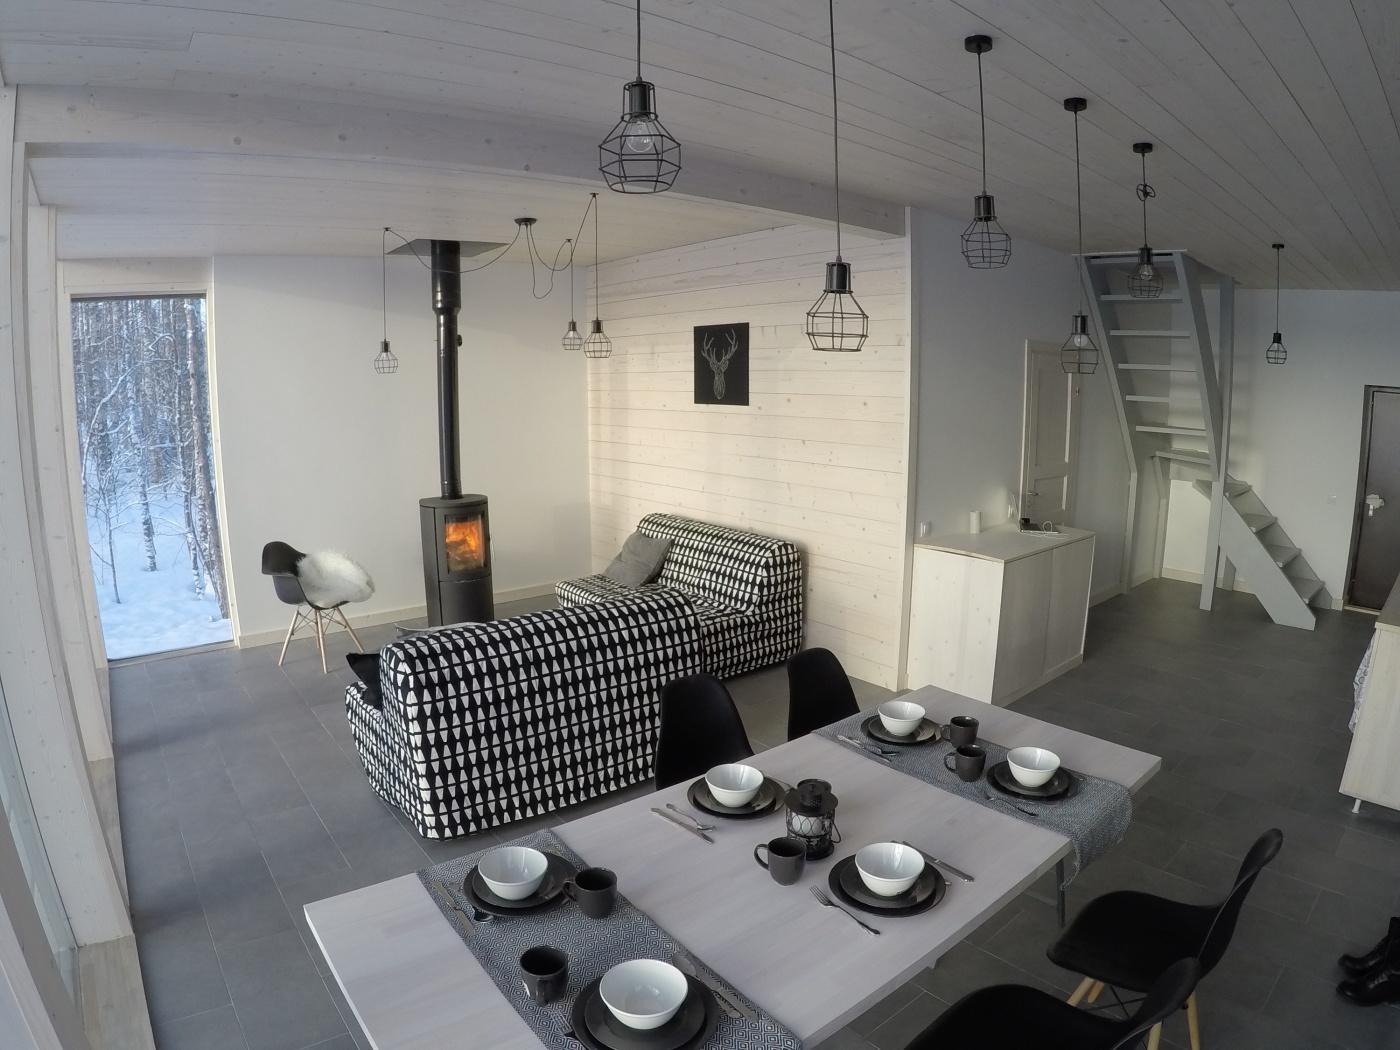 Коттеджный комплекс «Ахвенлампи» Республика Карелия Лофт-хаус «Матриярви», фото 10